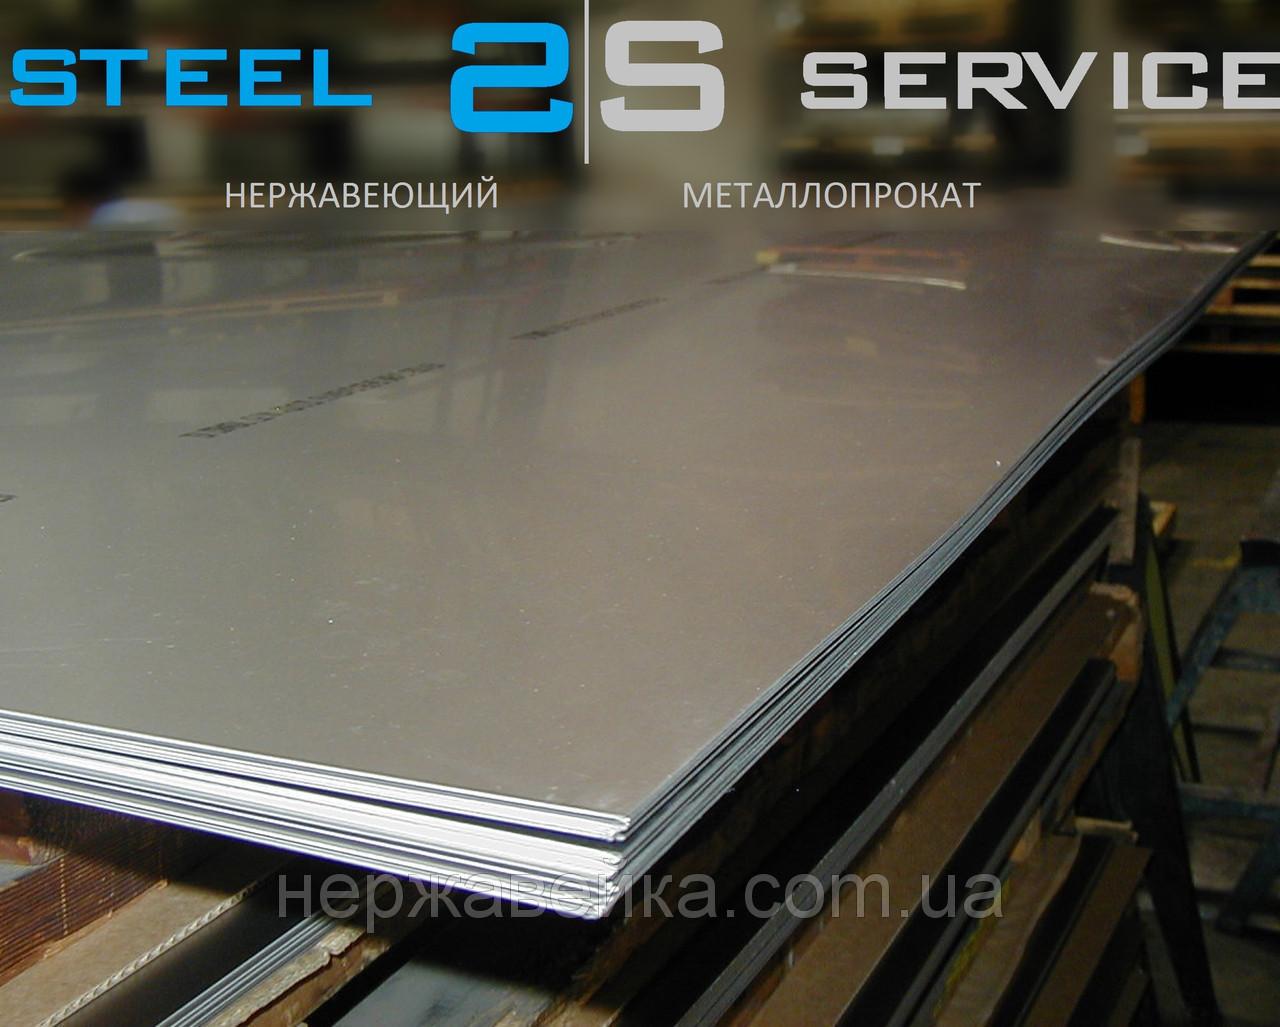 Листовая нержавейка 2х1250х2500мм  AISI 316Ti(10Х17Н13М2Т) 2B - матовый,  кислотостойкий